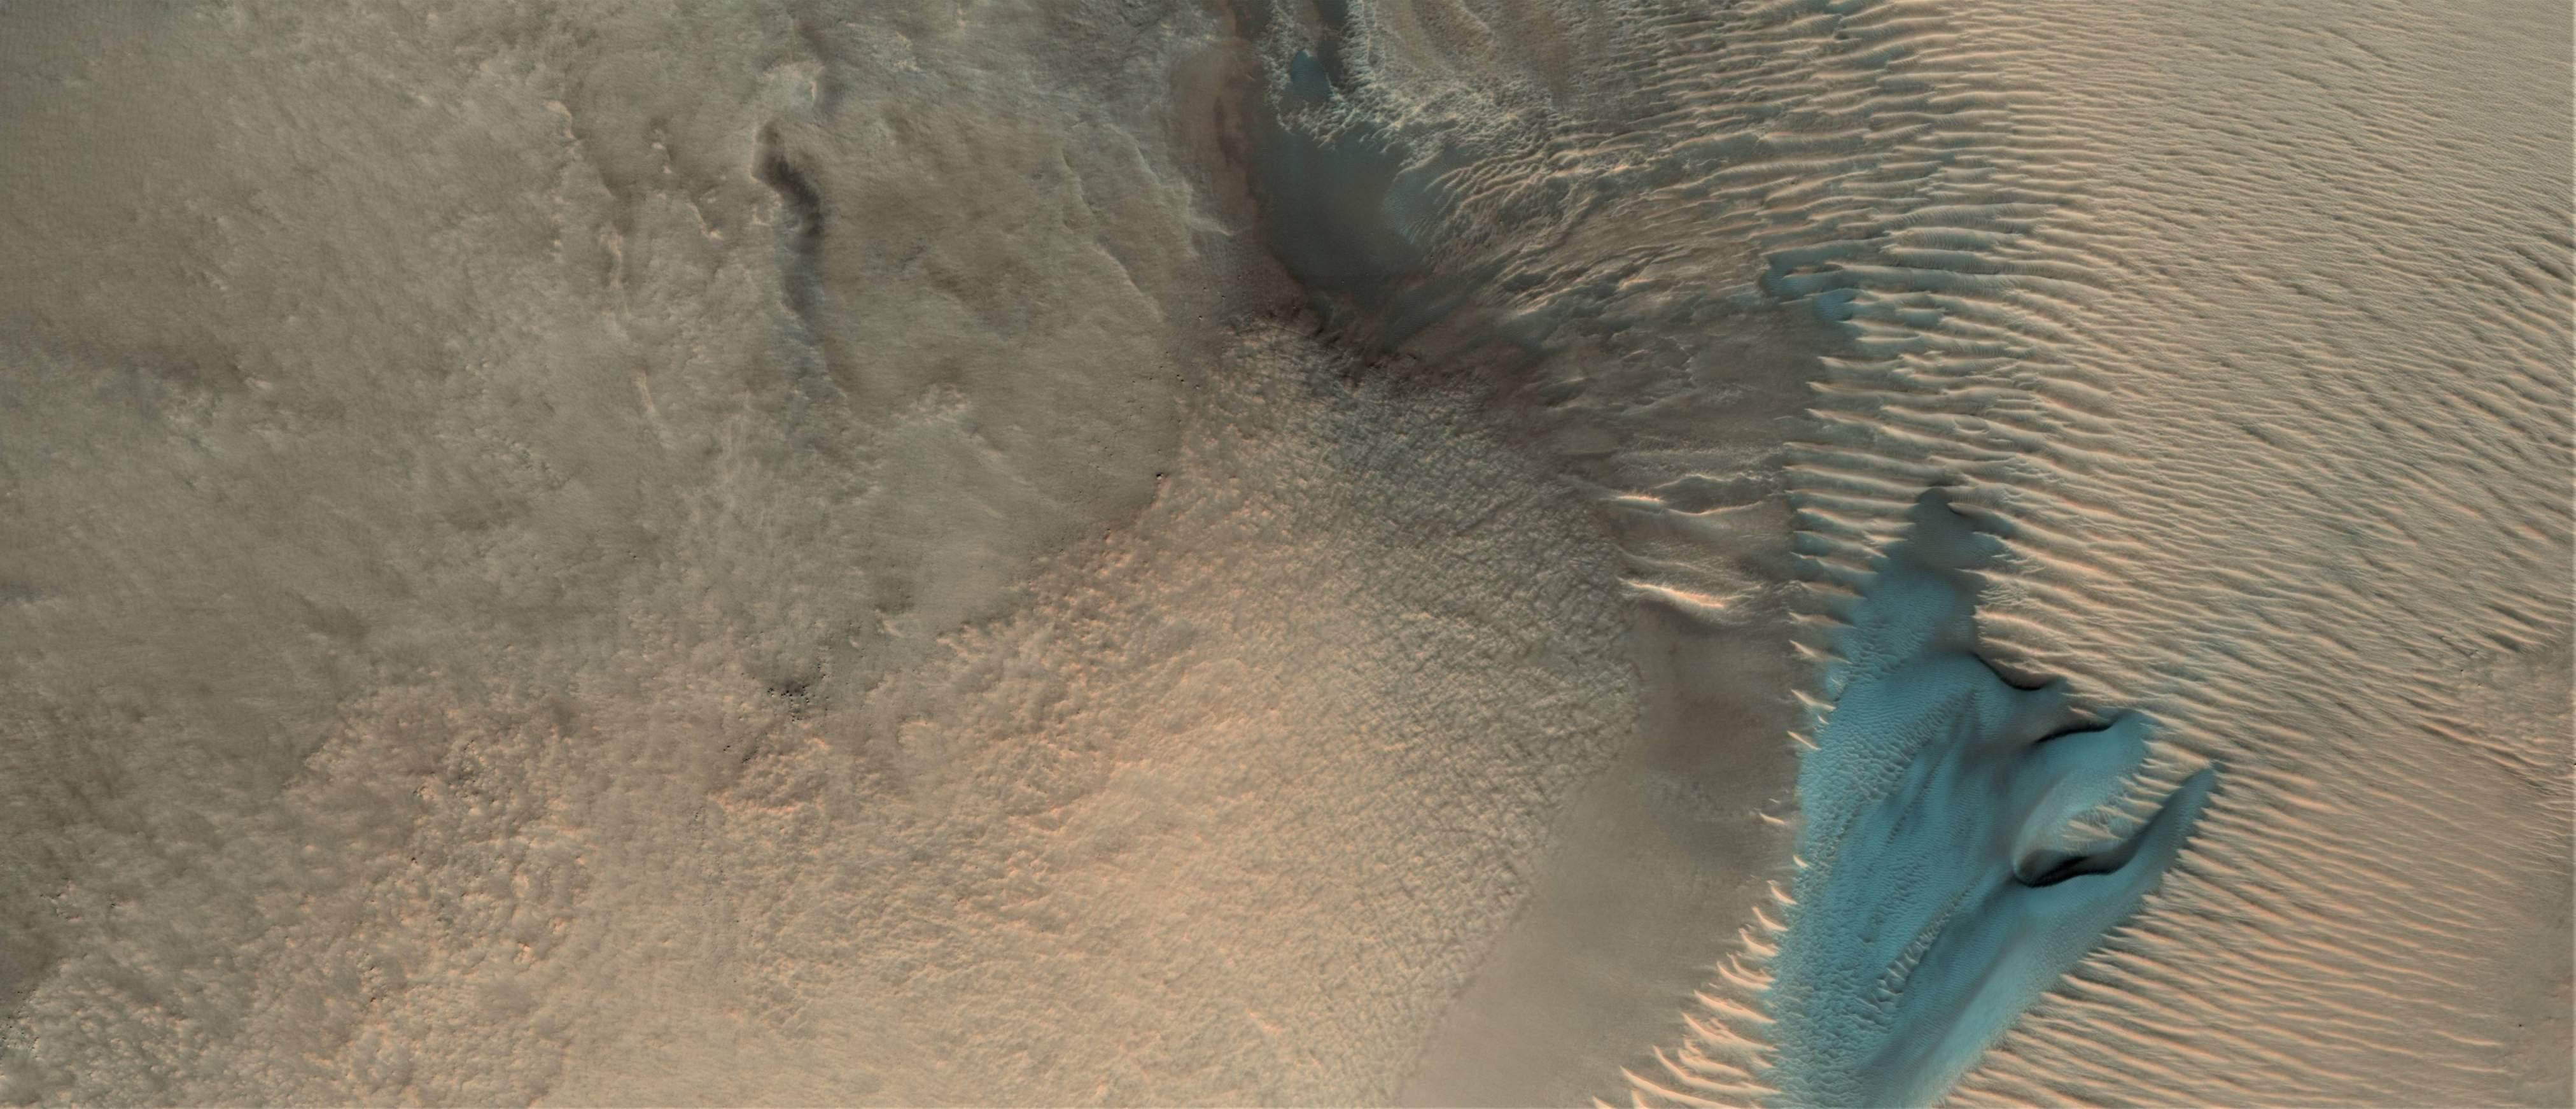 blue dune 01242018 (NASA MRO) overview 2(c)